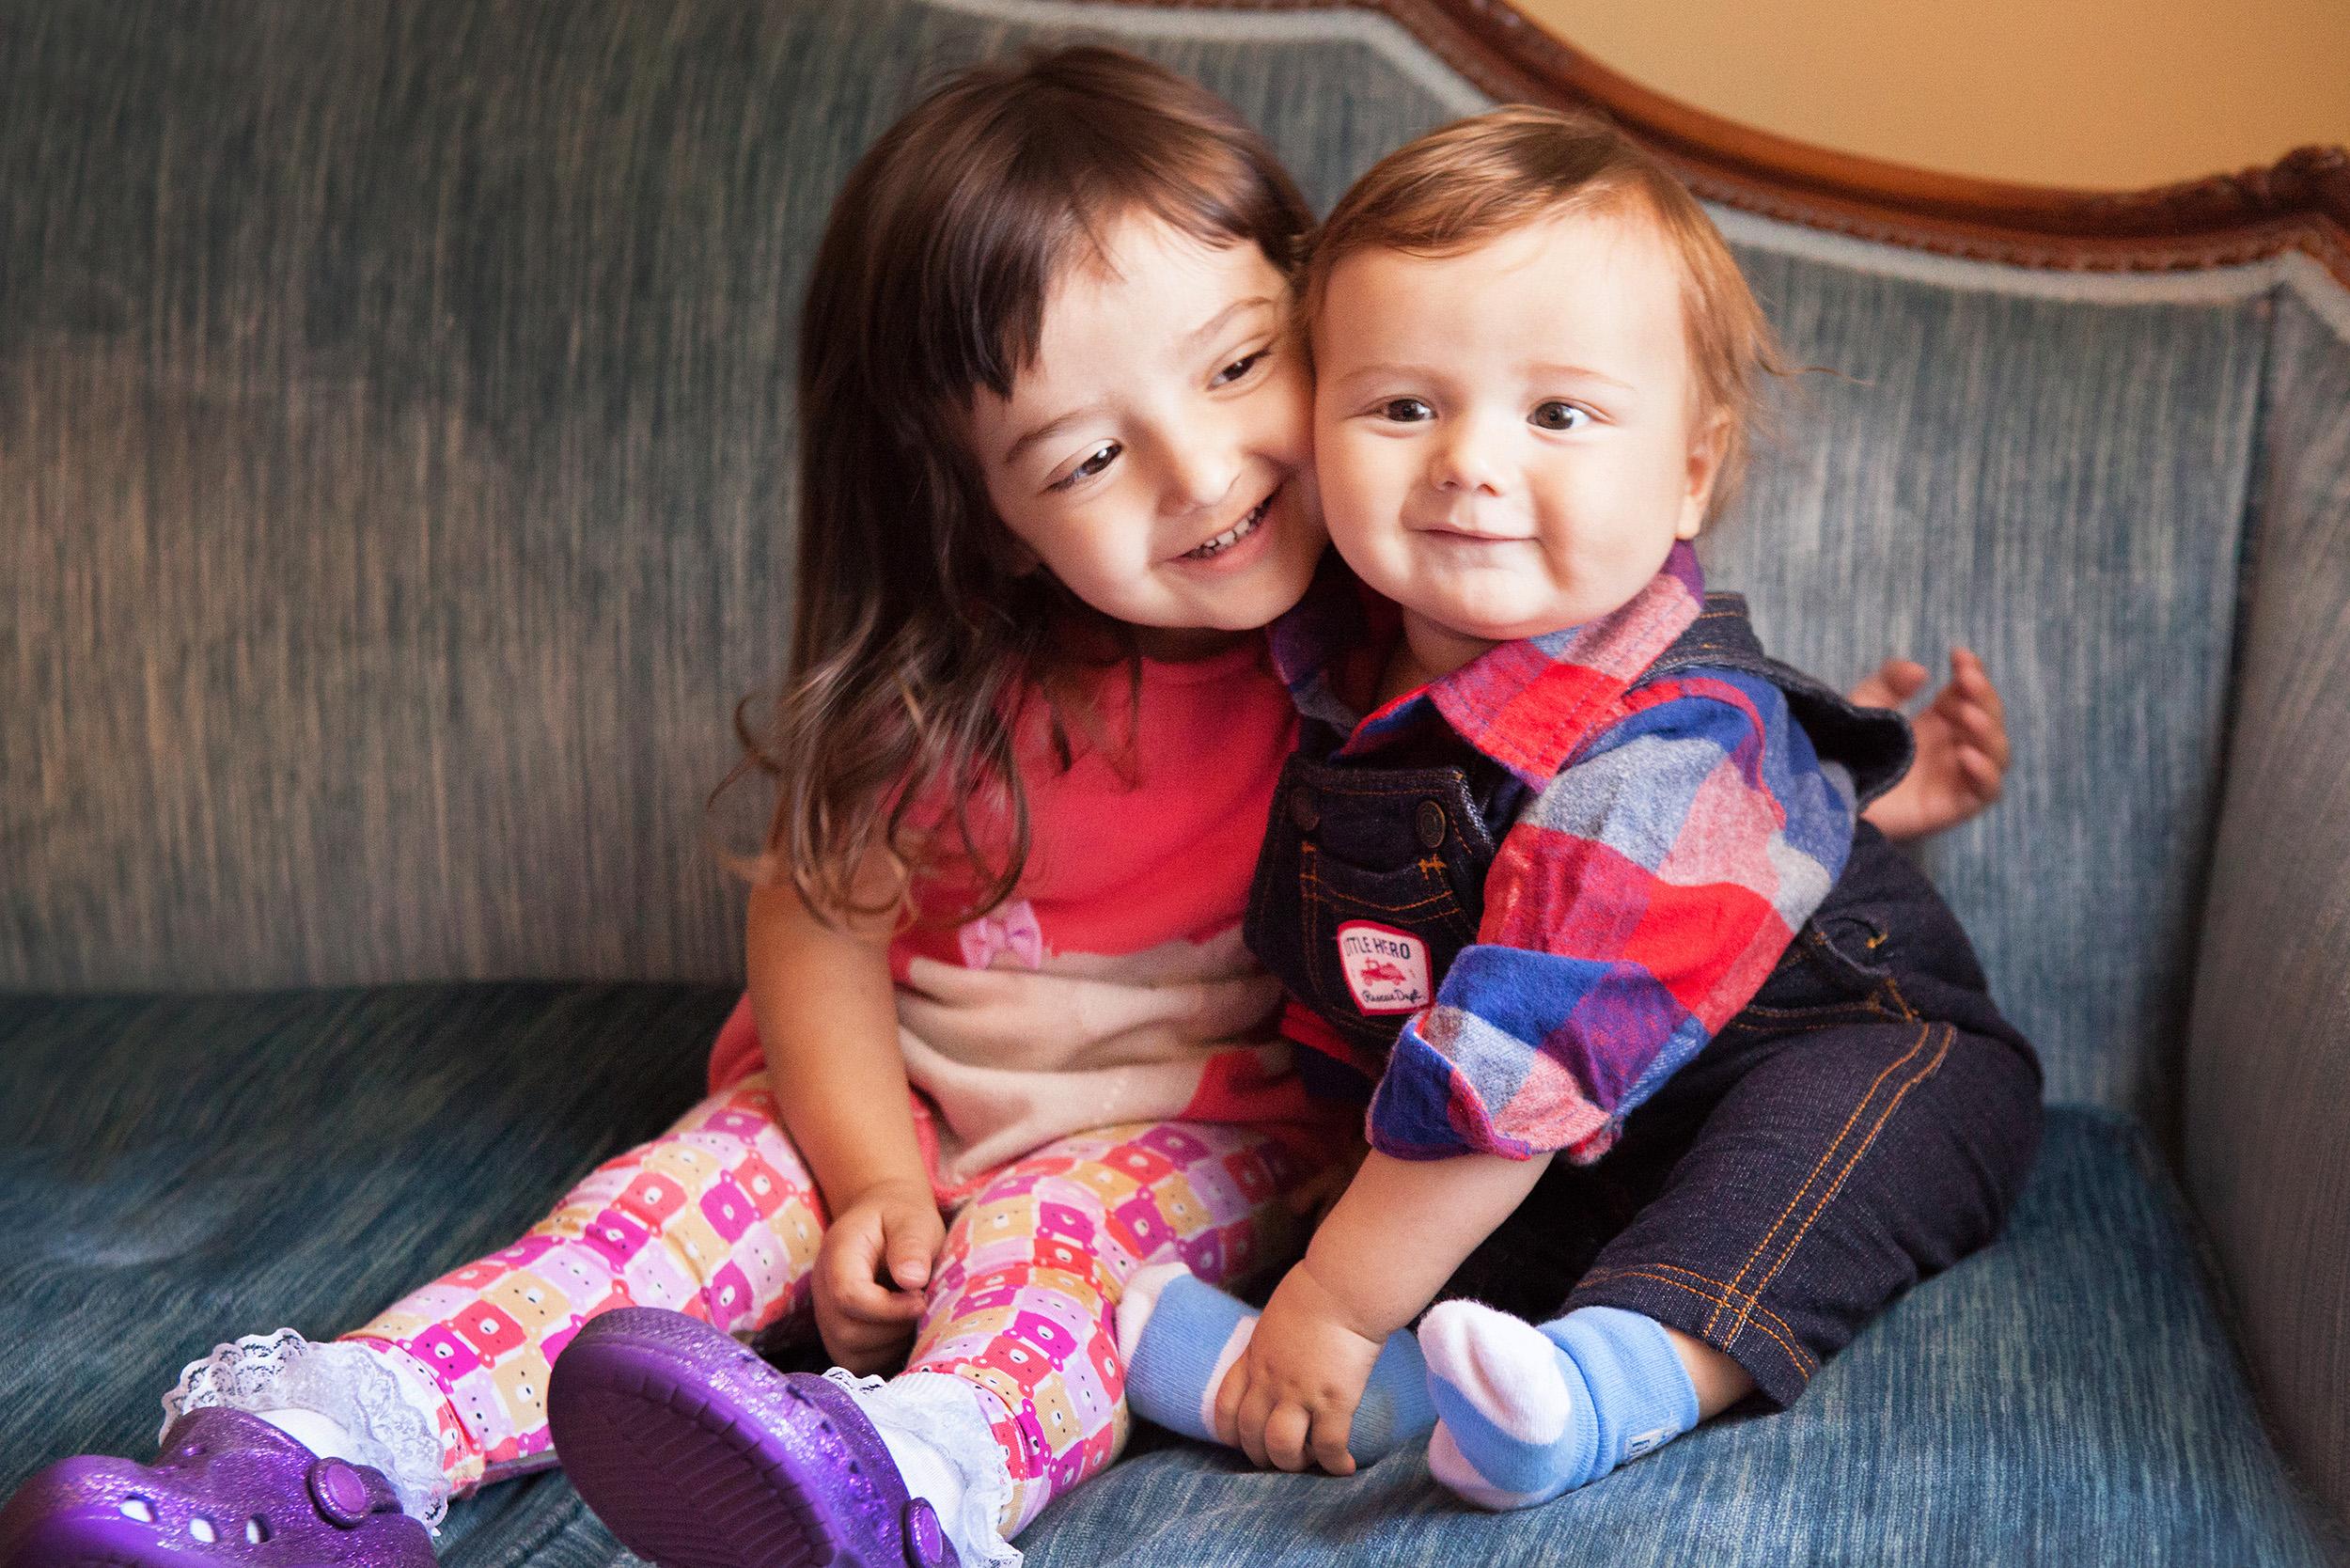 WEB_Kids on loveseat-114.jpg